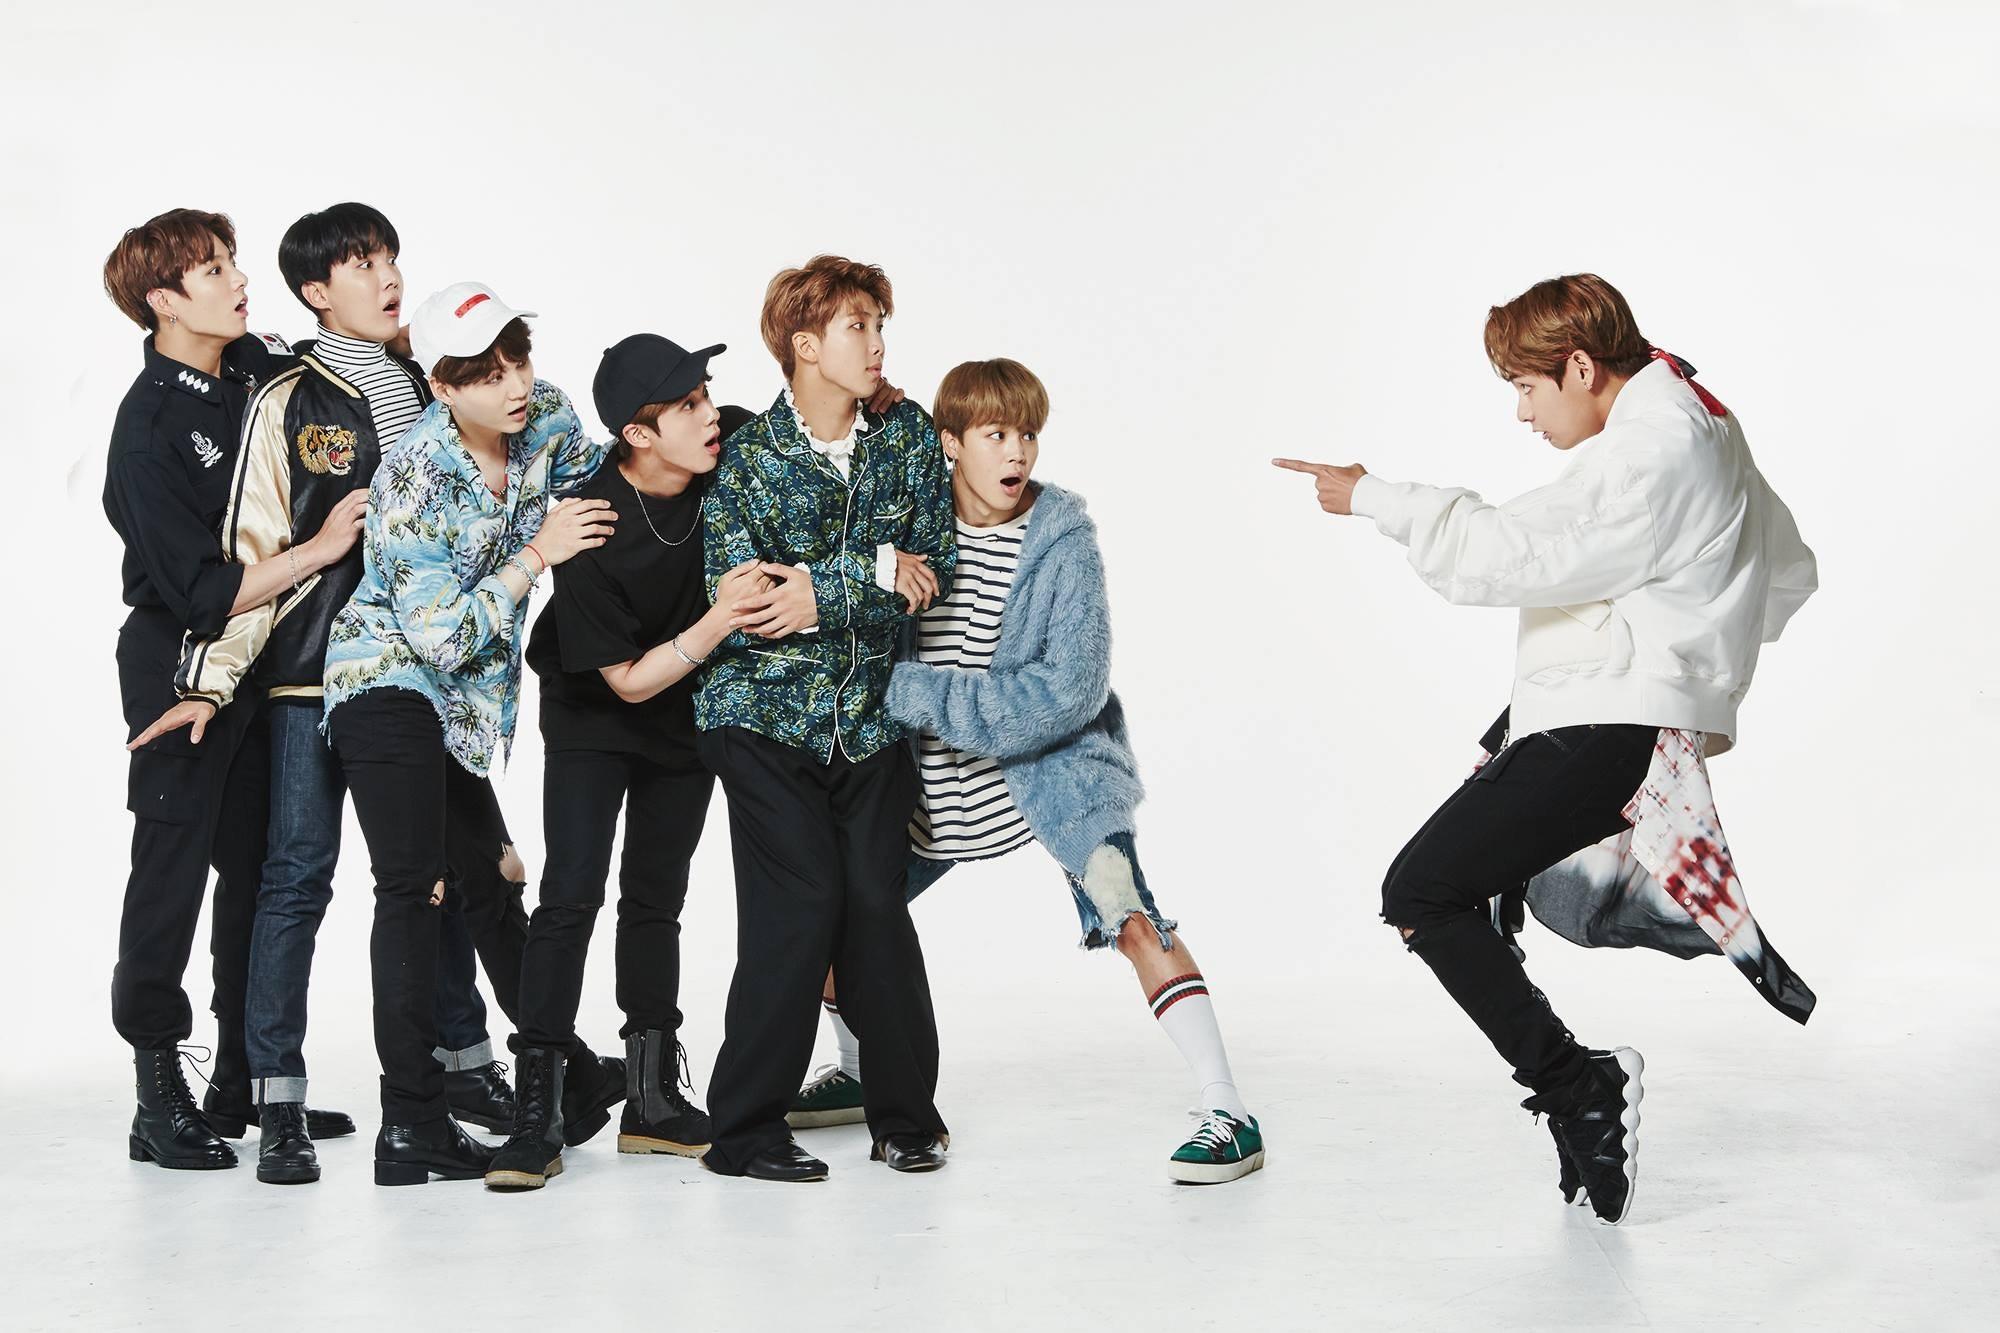 Wallpaper : BTS, J Hope, V, Jin, Suga, rm, Jimin, Jungkook